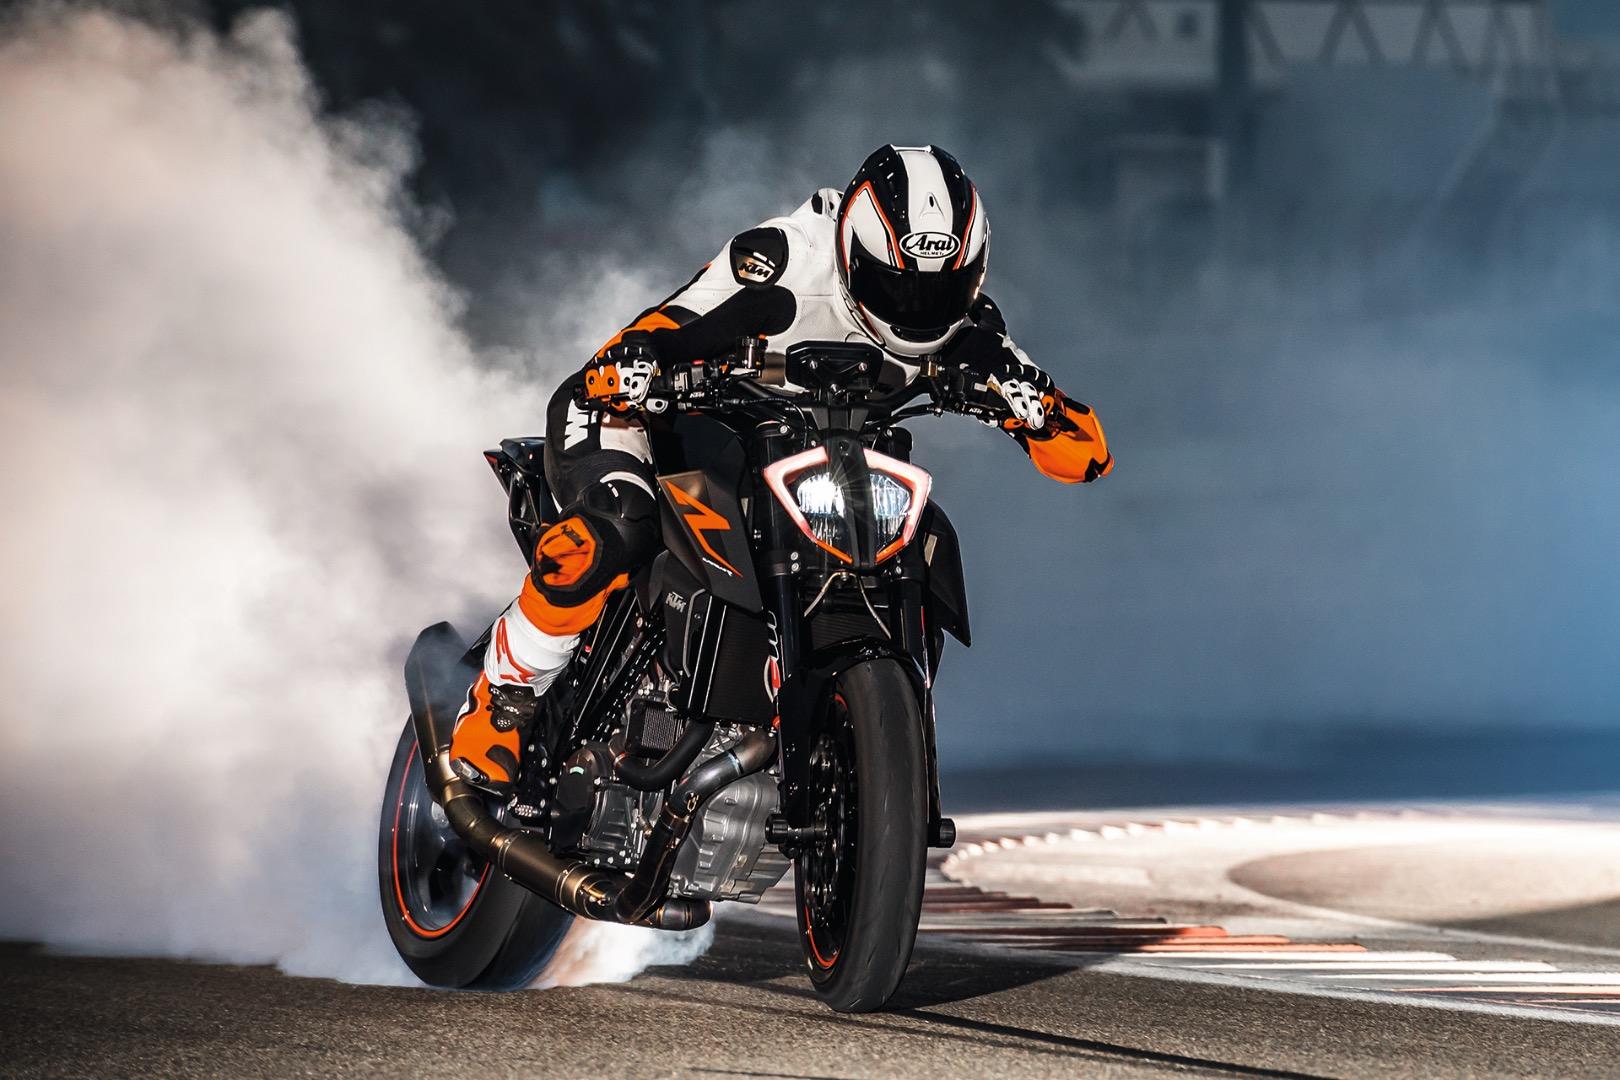 2017 Ktm 1290 Super Duke Roars To Flame Up The Race Track In Qatar